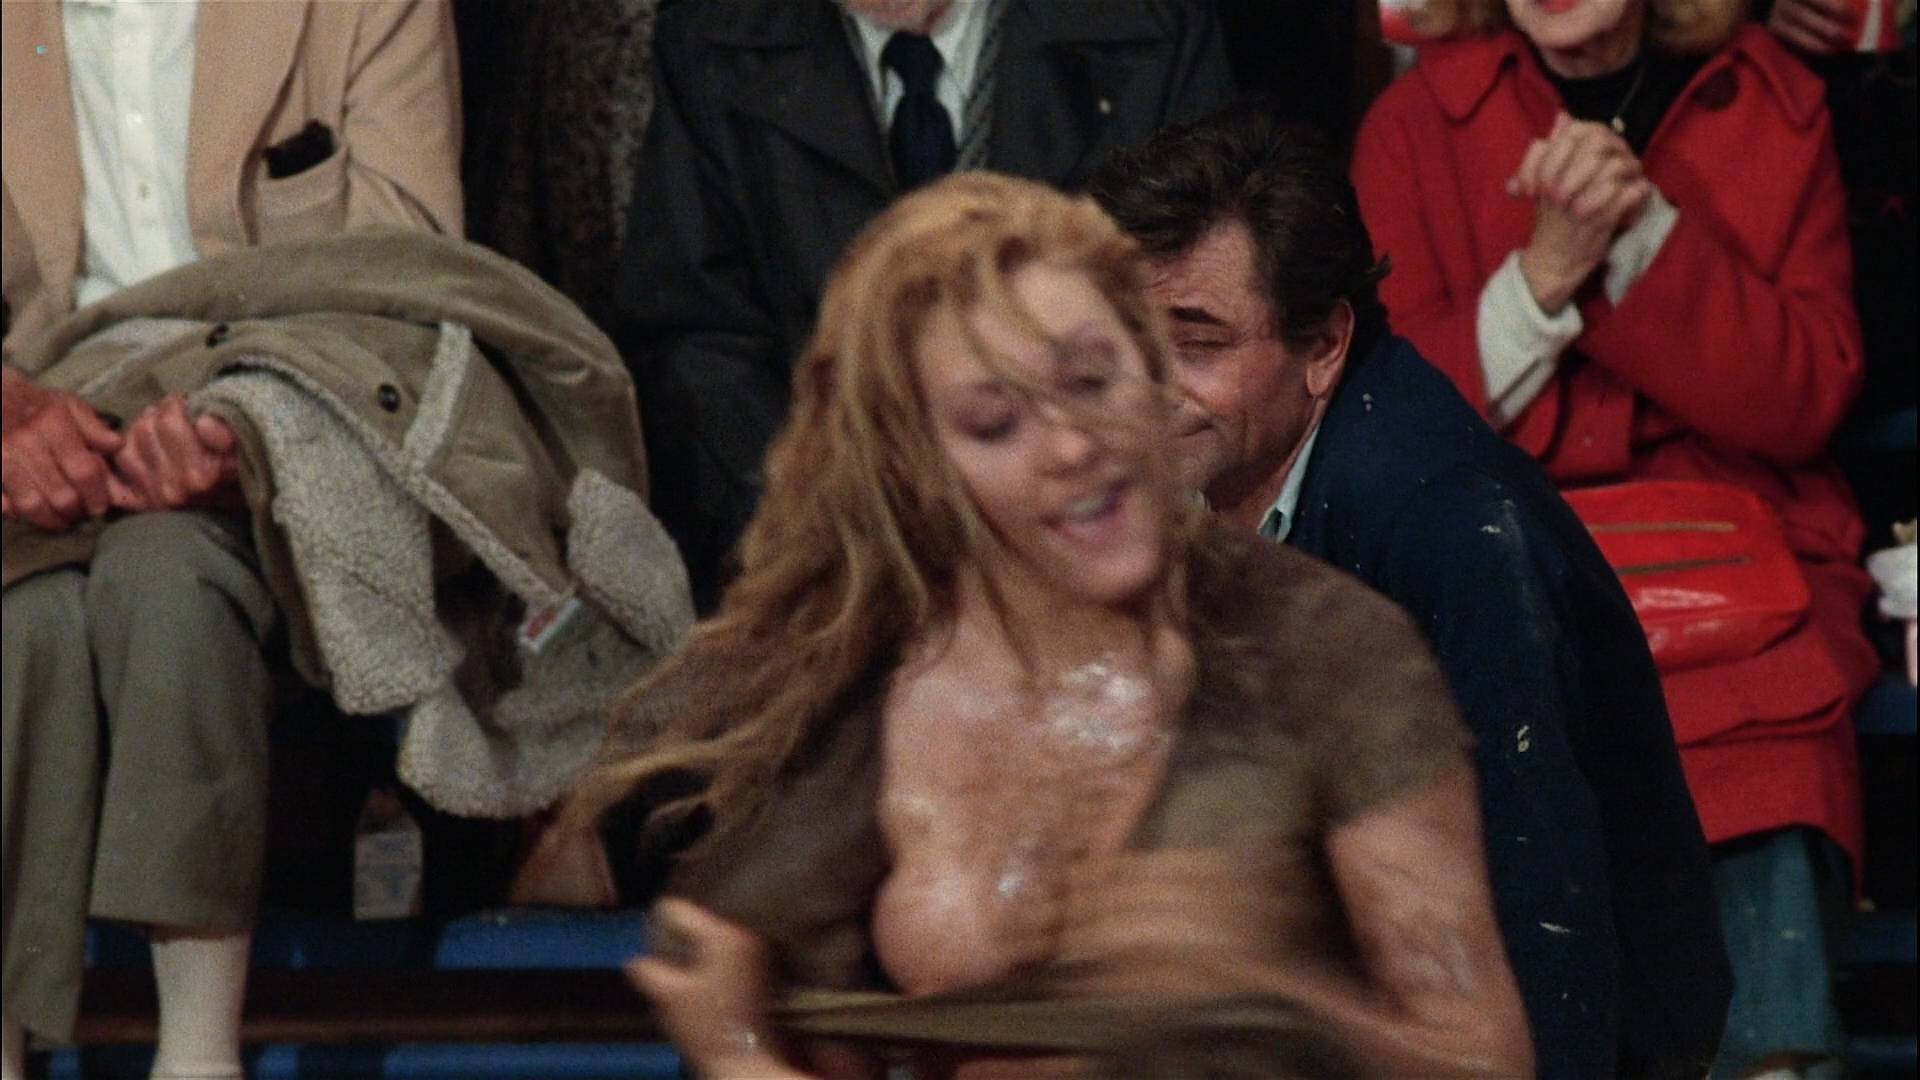 Angela aames topless